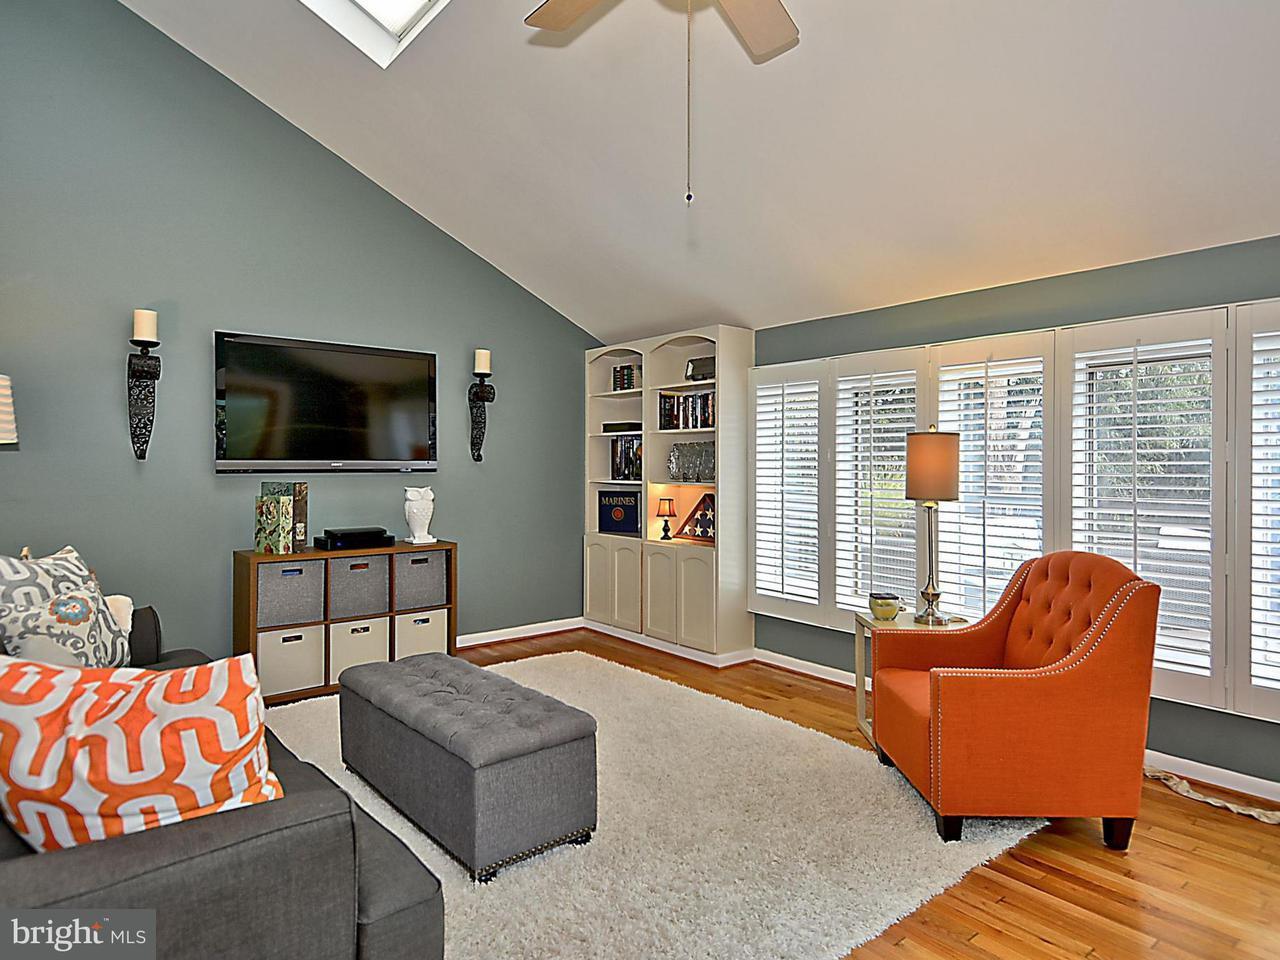 Single Family Home for Sale at 3001 Grant Street 3001 Grant Street Arlington, Virginia 22202 United States